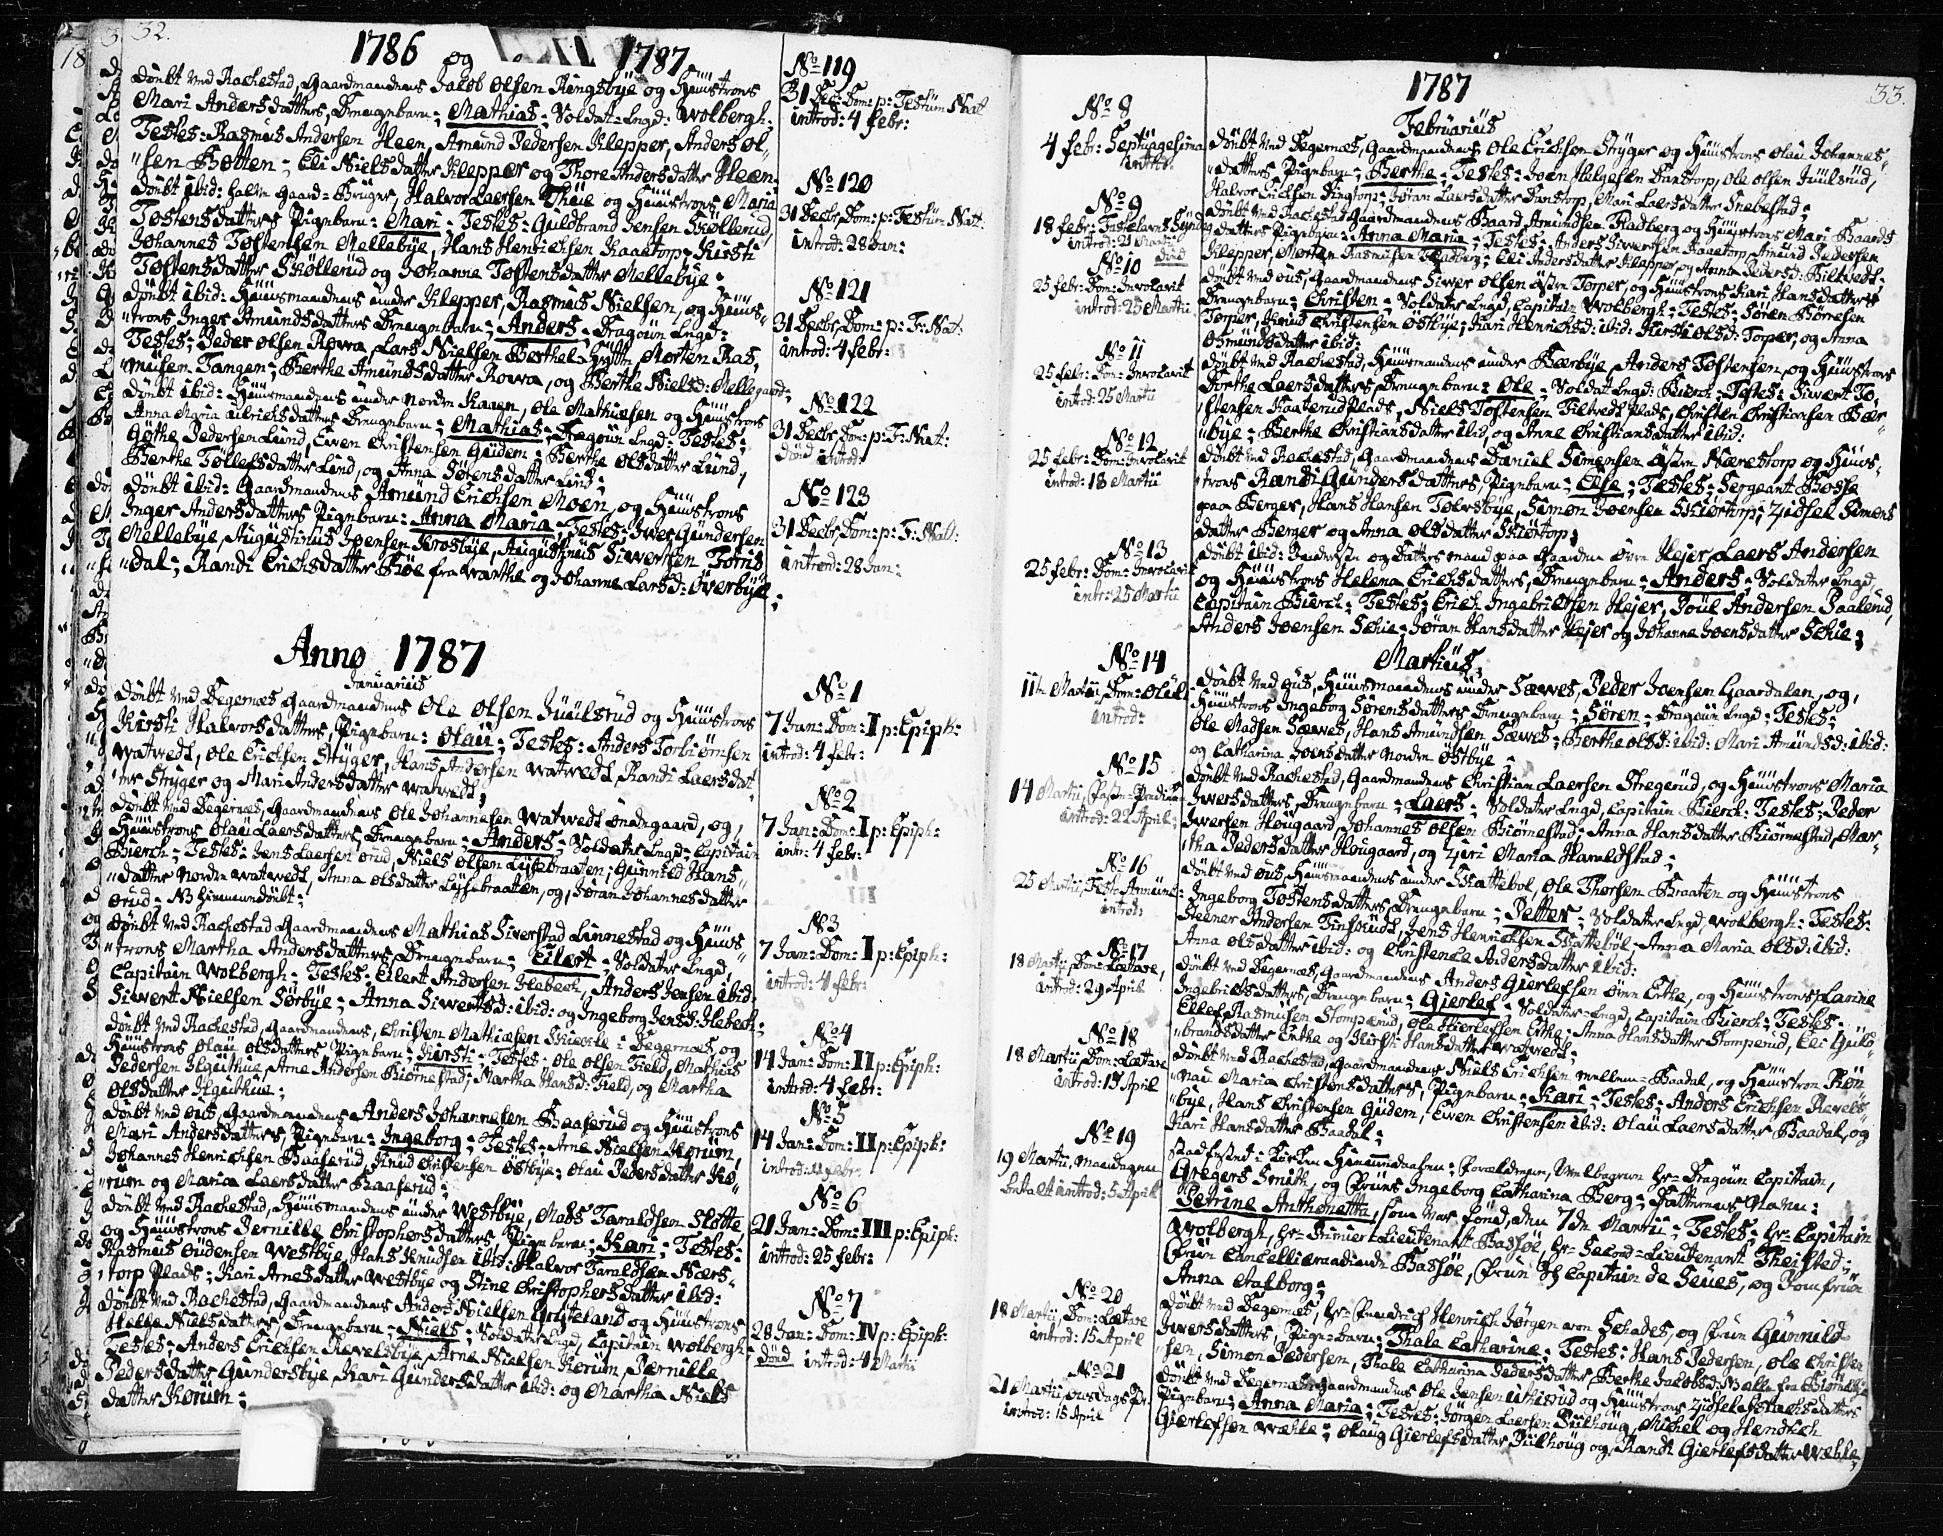 SAO, Rakkestad prestekontor Kirkebøker, F/Fa/L0005: Ministerialbok nr. I 5, 1784-1814, s. 32-33